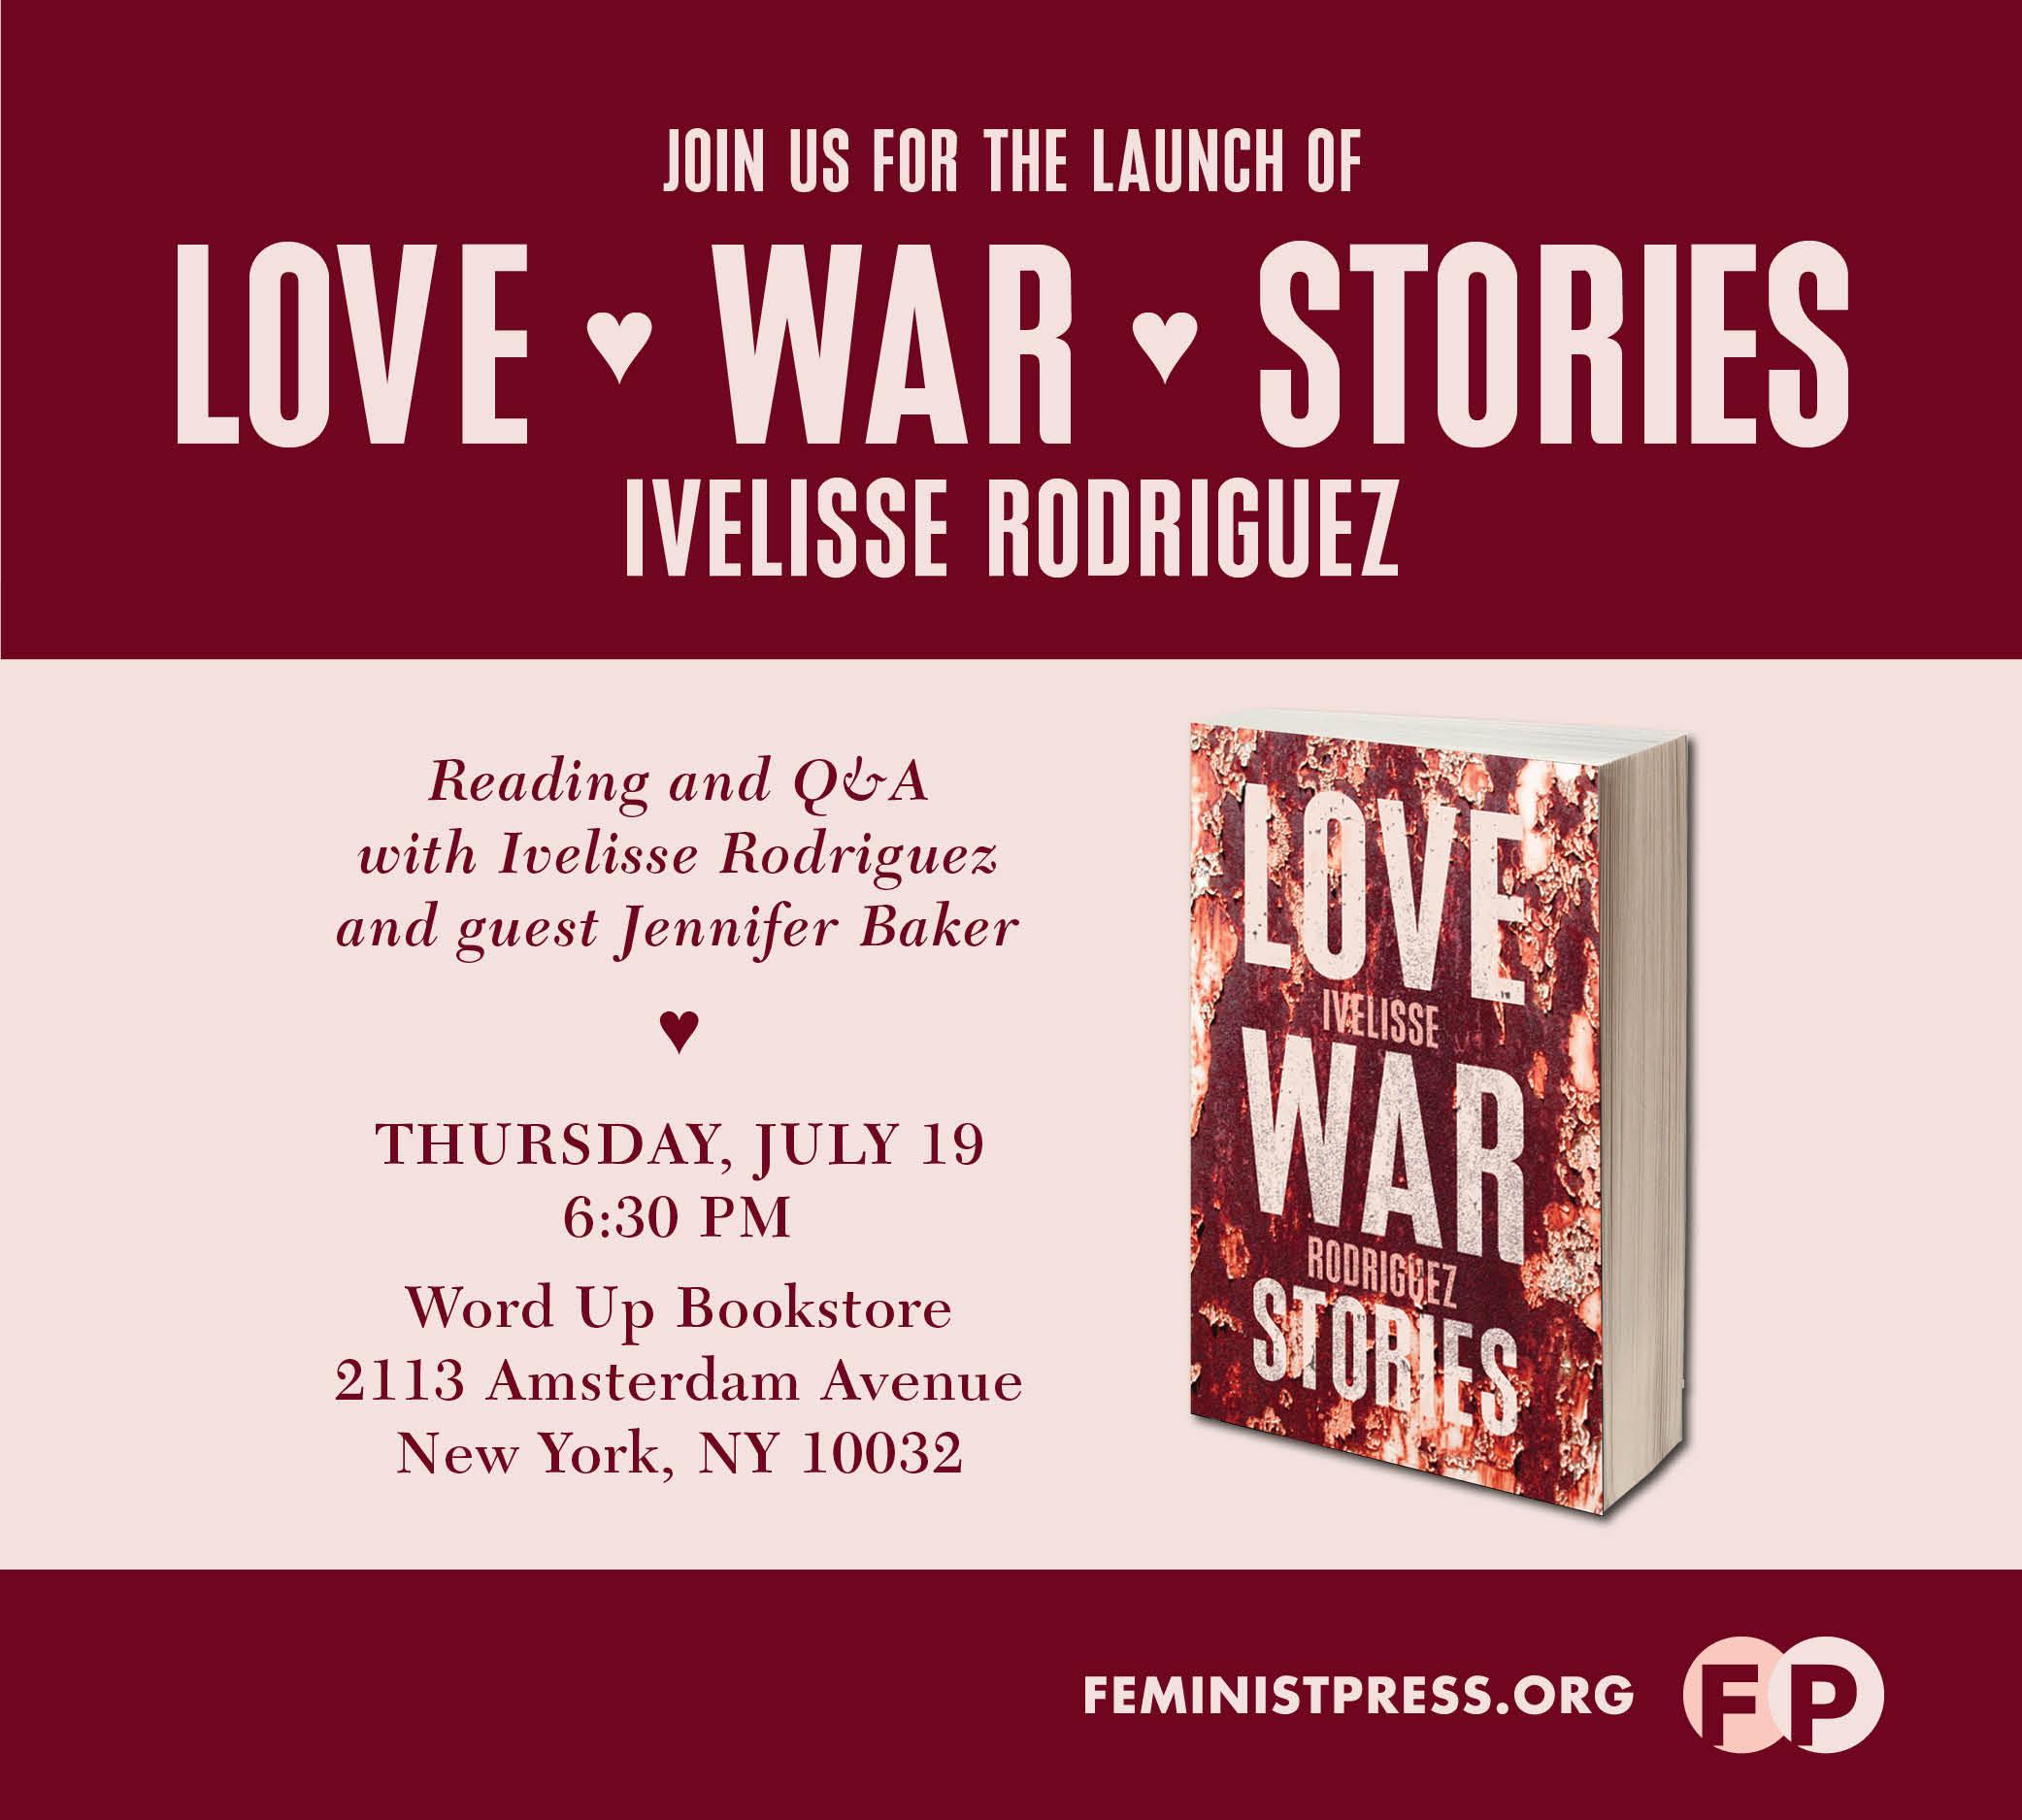 LOVE_WAR_STORIES_Event_eblast_WORD_UP (1).jpg